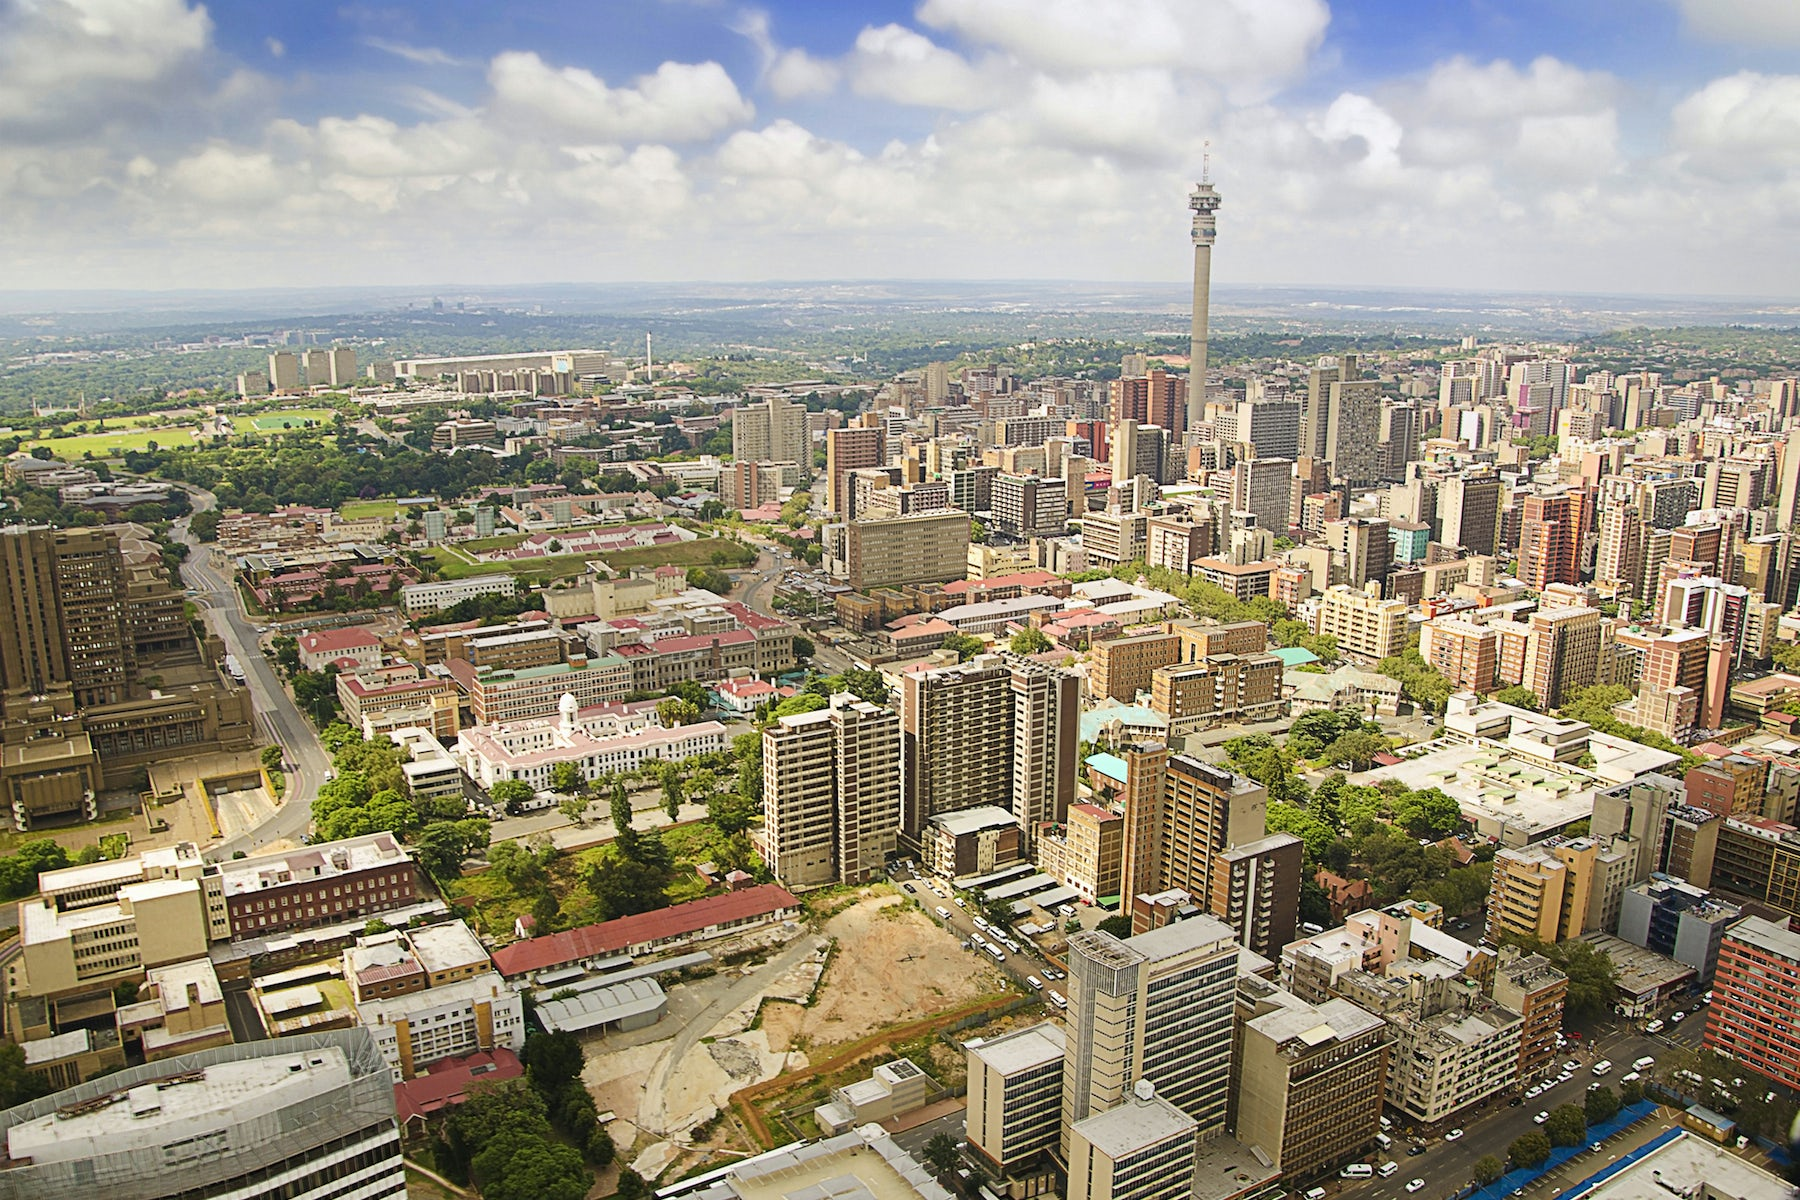 Johannesburg | Source: Shutterstock